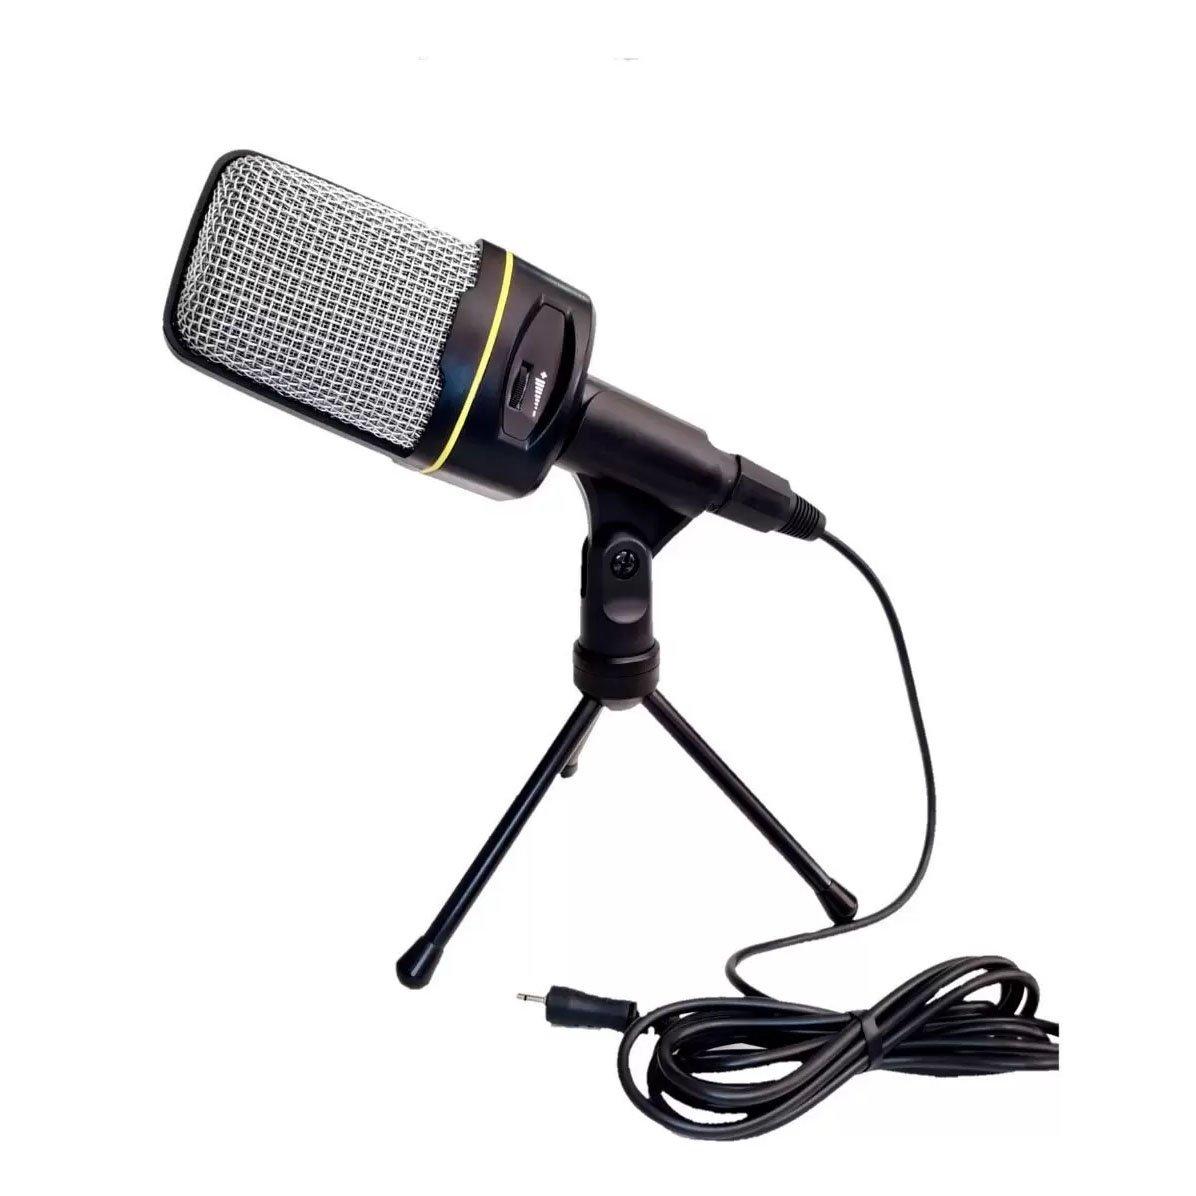 microfone gamer p2 mic 8641 inova preto 51202 2000 203524 1